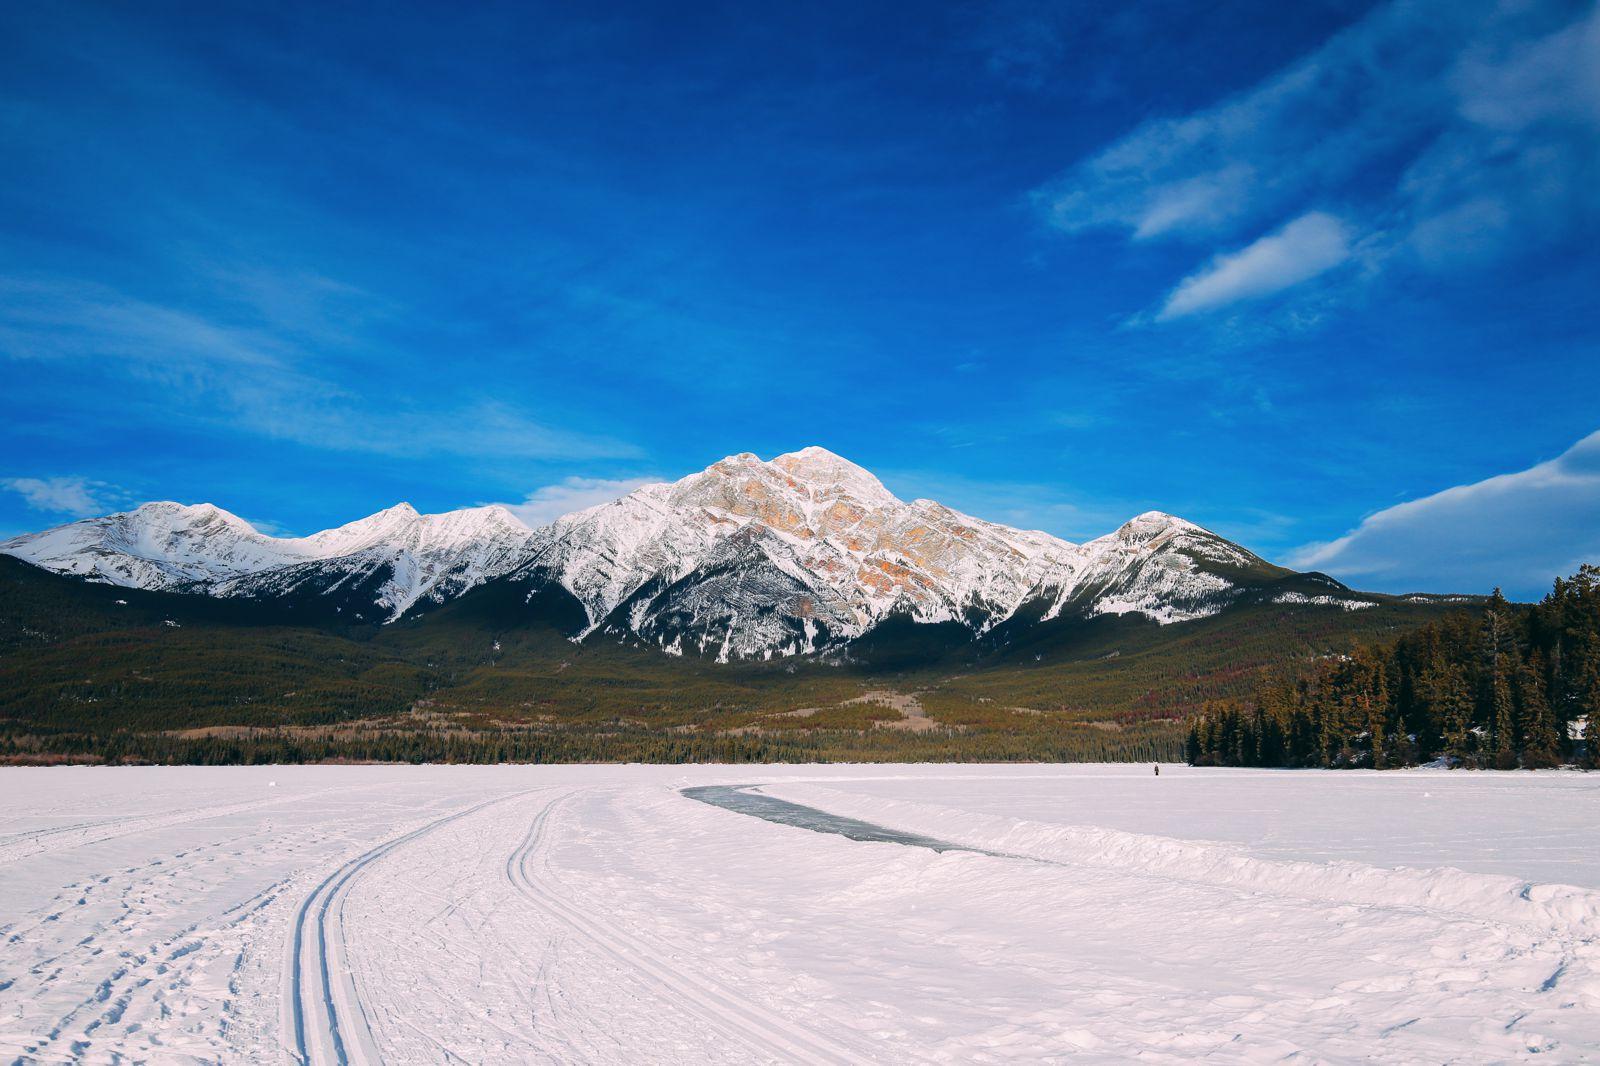 Dog Sledding In Jasper And Ice Hockey In Edmonton - 2 Canadian 'Must-Do's! (12)